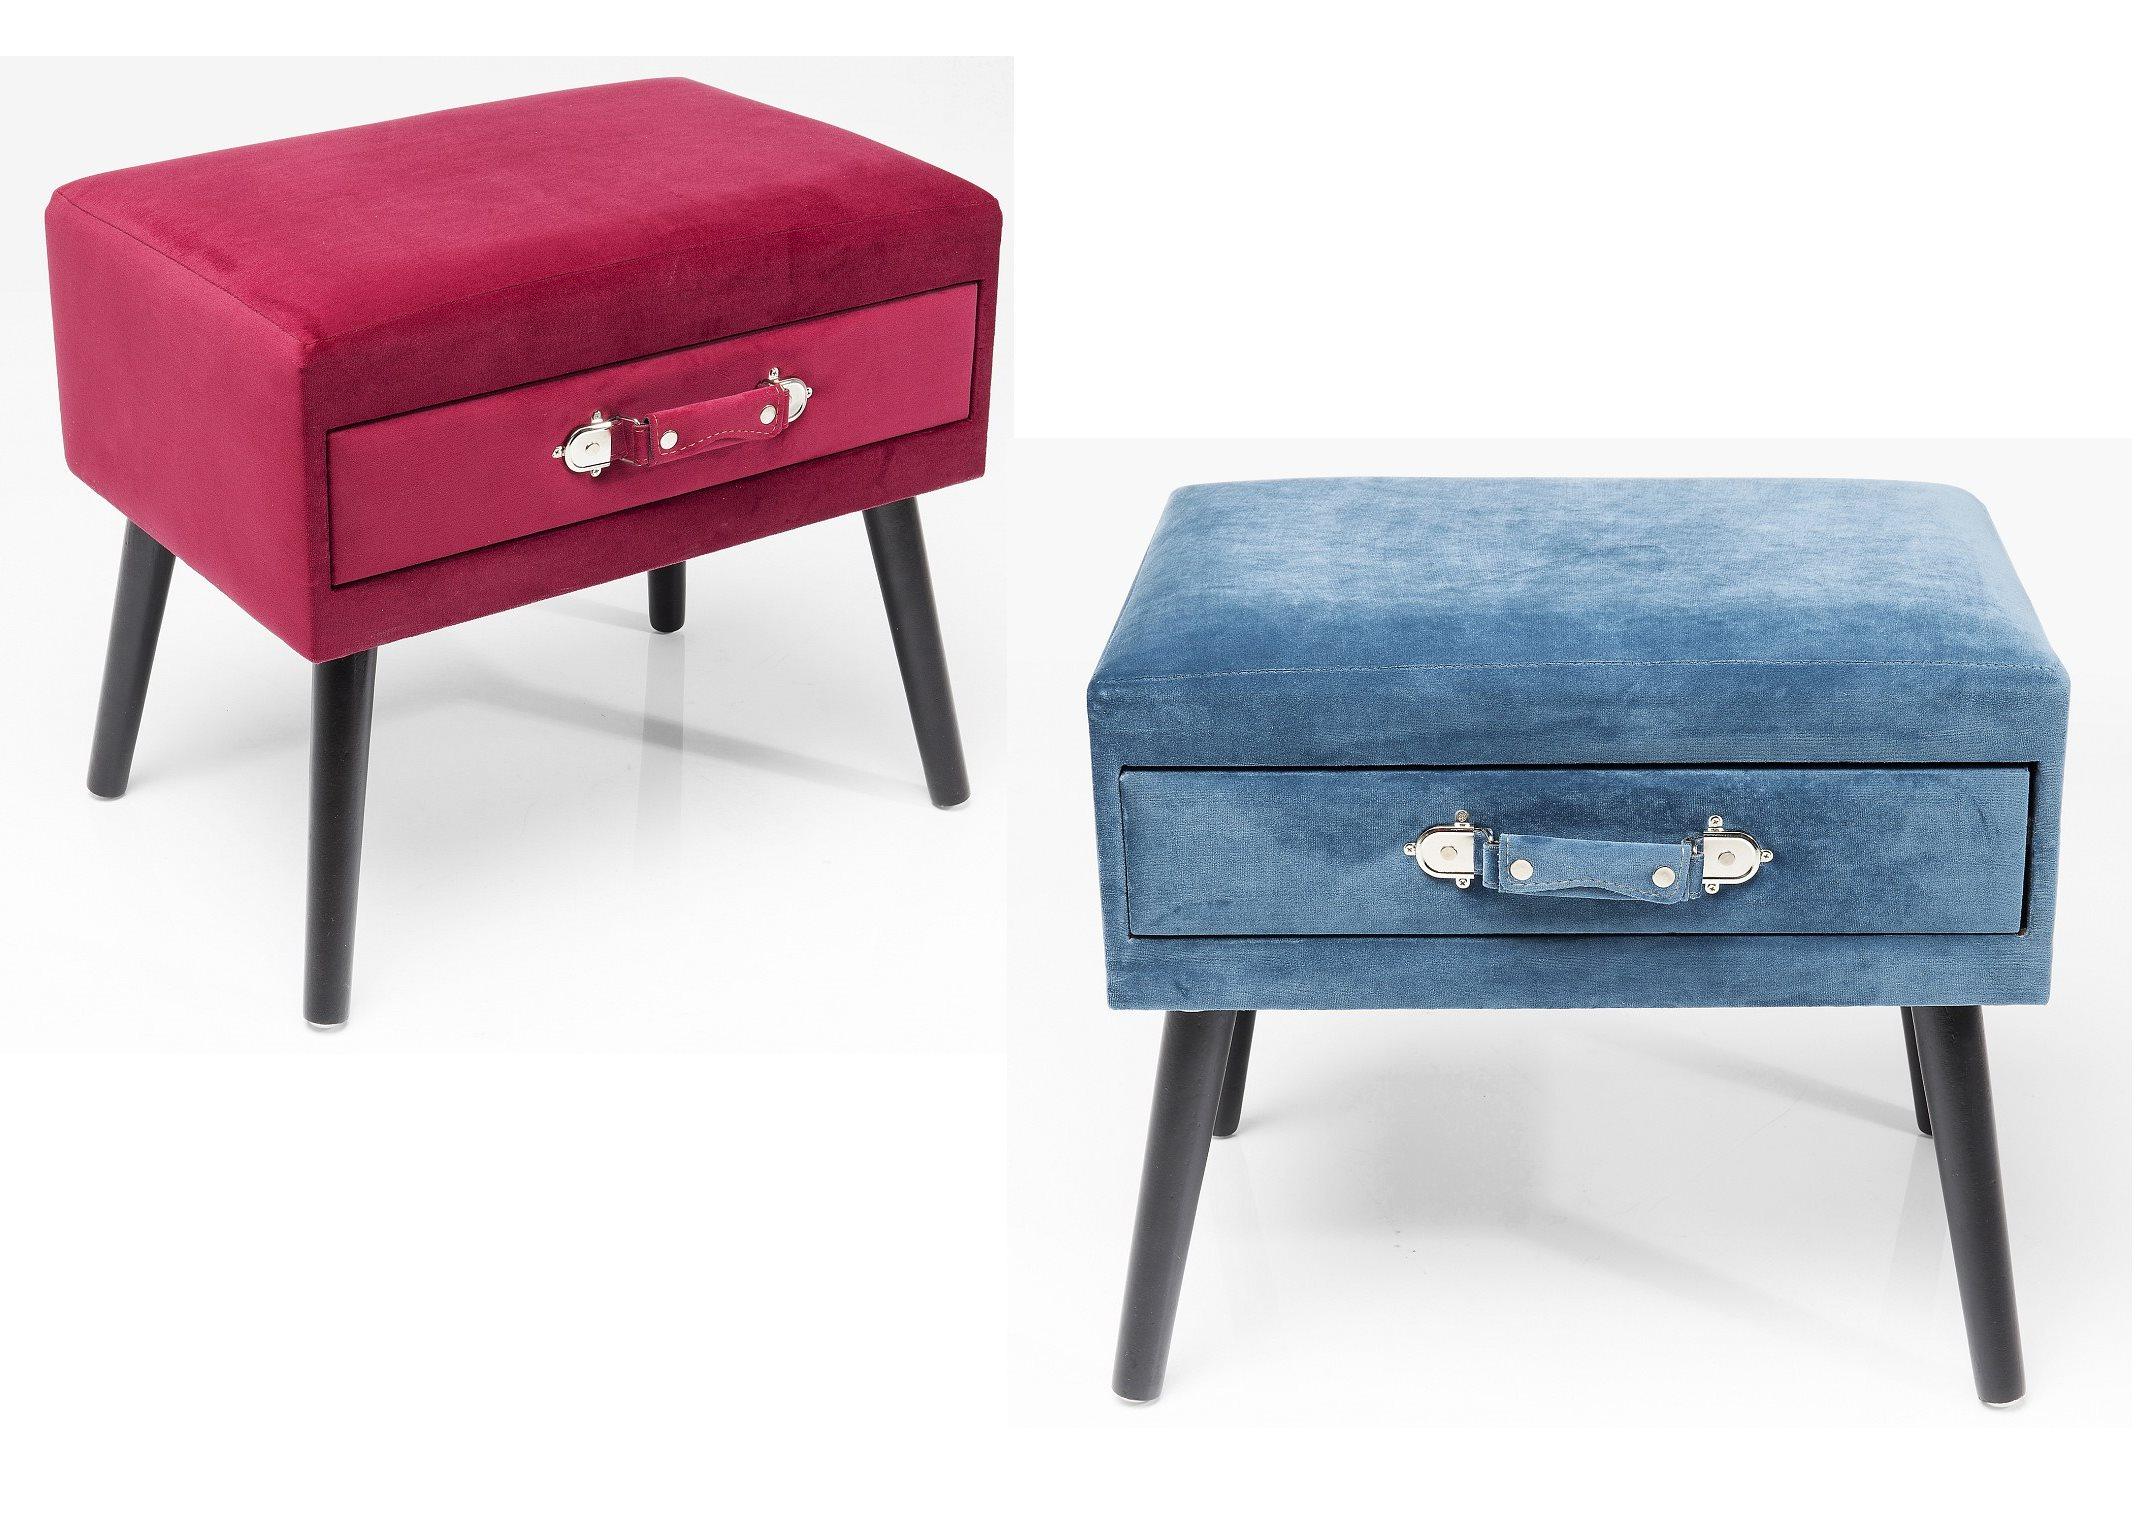 hocker bank im freudenhaus online shop kaufen. Black Bedroom Furniture Sets. Home Design Ideas